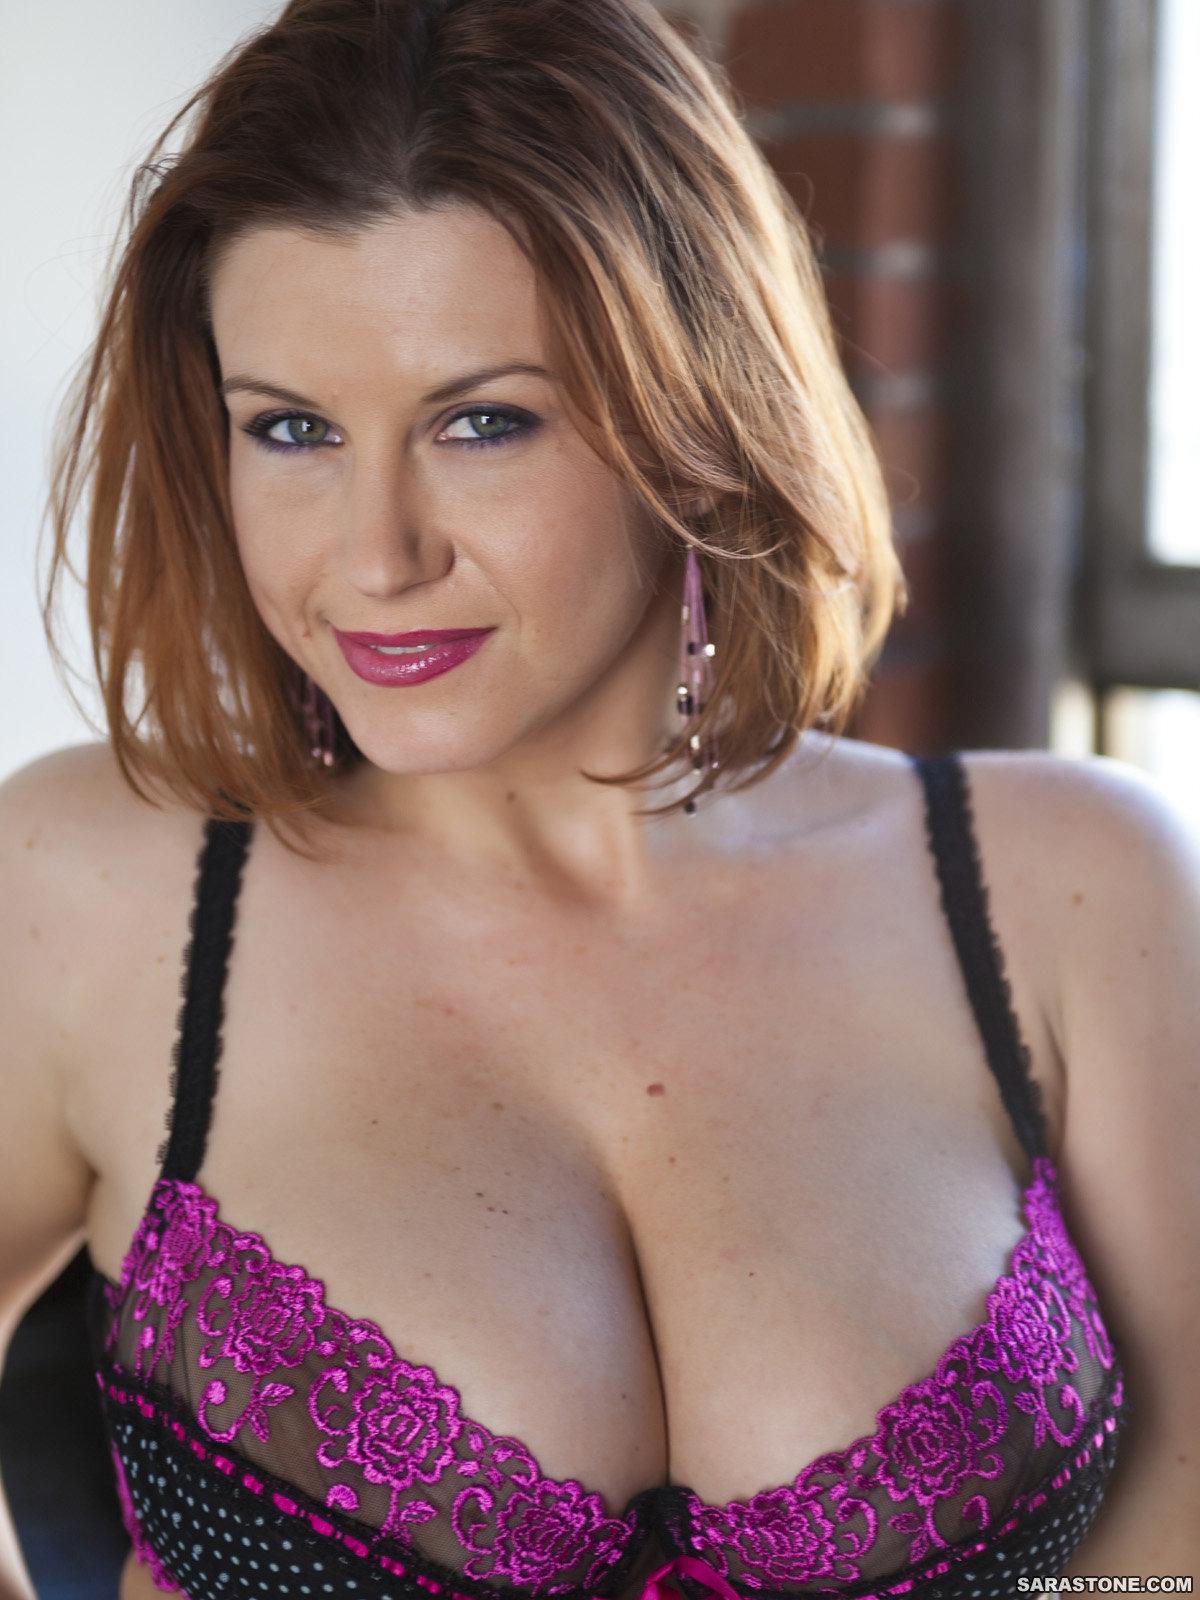 Top-heavy MILF Sara Stone enjoys a fervent threesome with hung lads № 266573 бесплатно